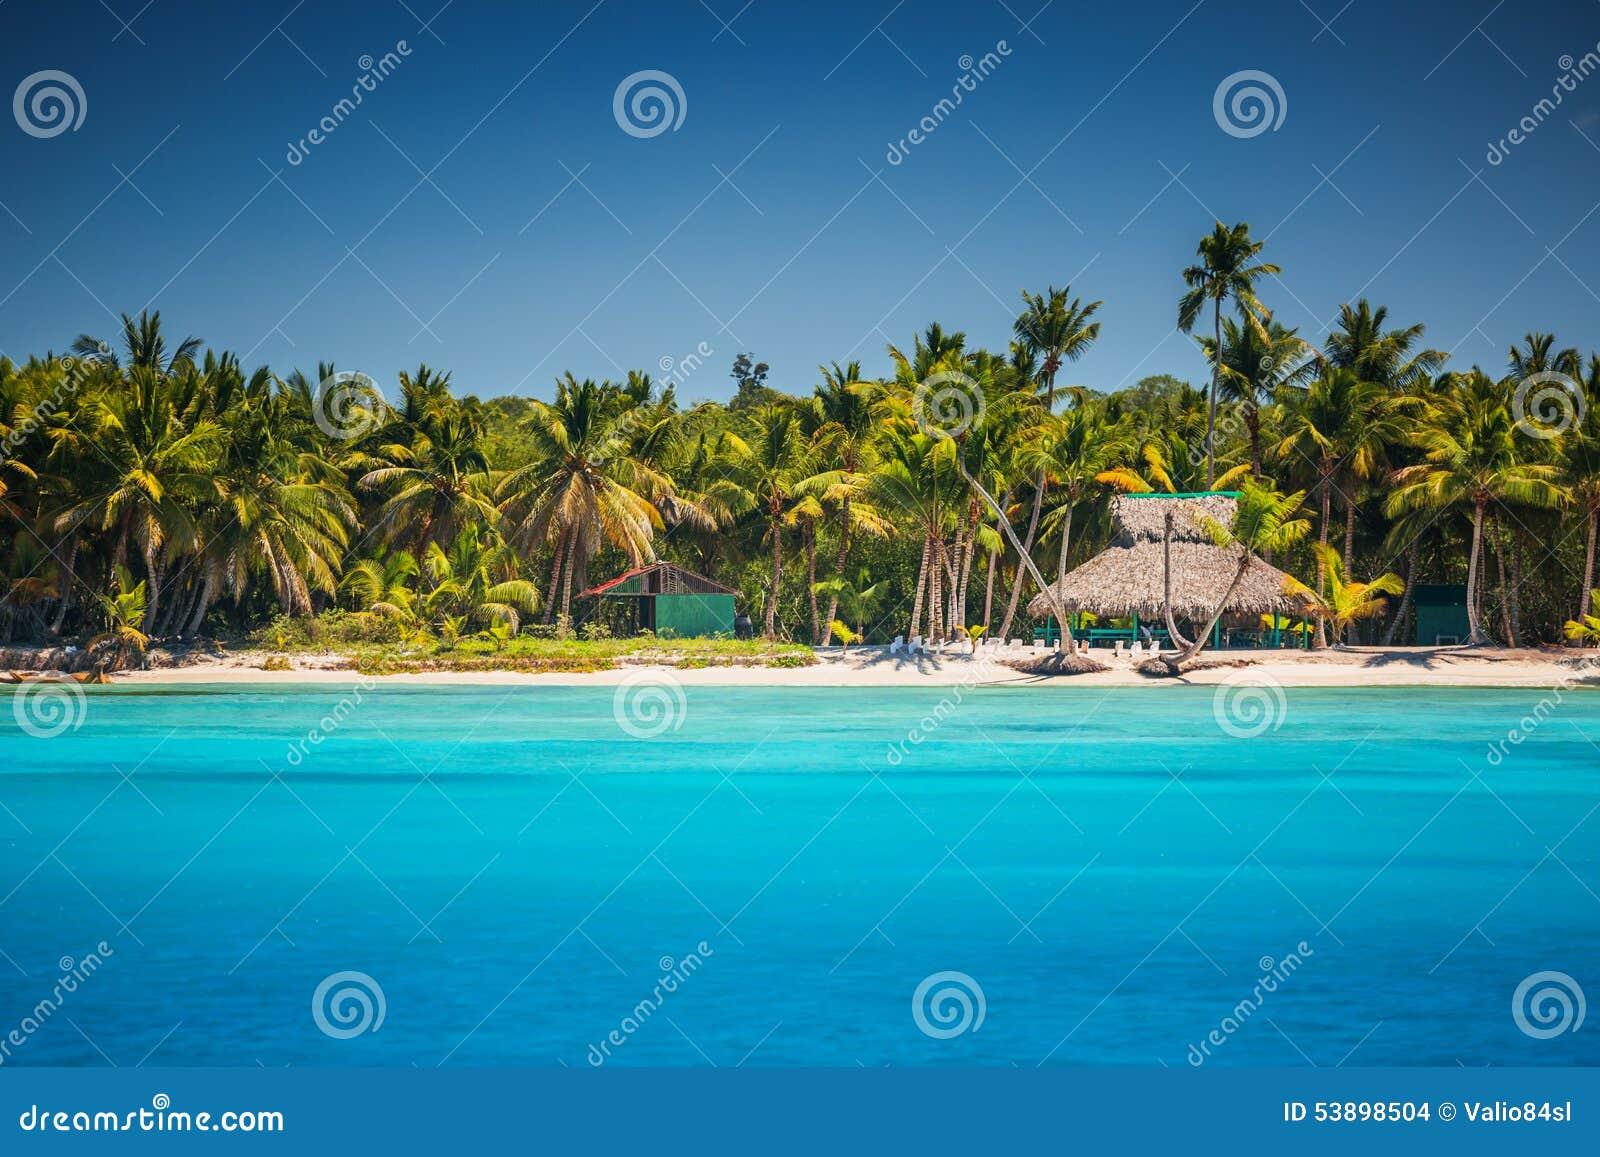 Caraïbisch wild strand in Punta Cana, Dominicaanse Republiek